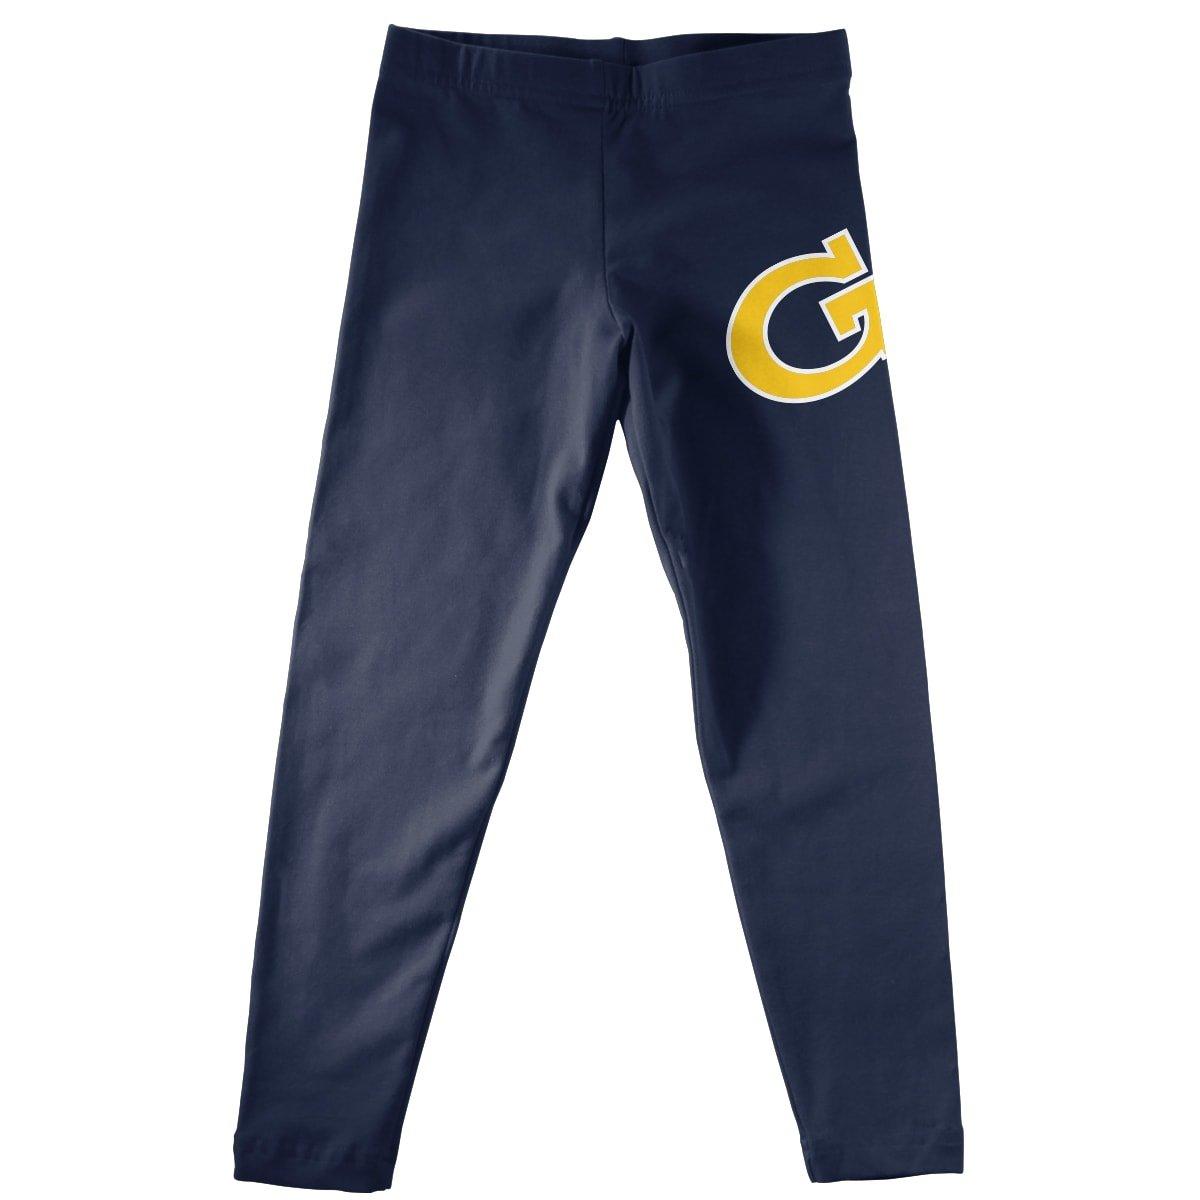 Vive La Fete Collegiate GA Tech Yellow Jackets Solid Navy Leggings